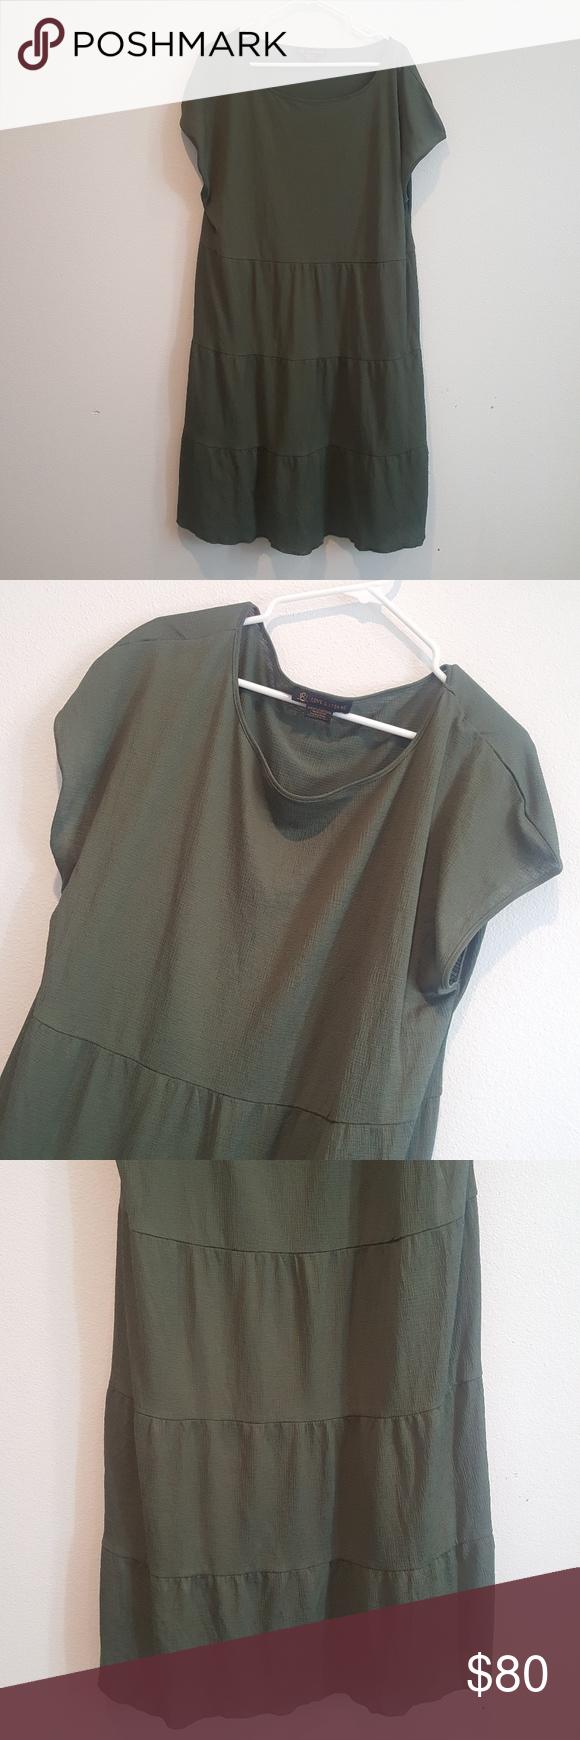 Addition elle love and legend plus size dress x my posh picks